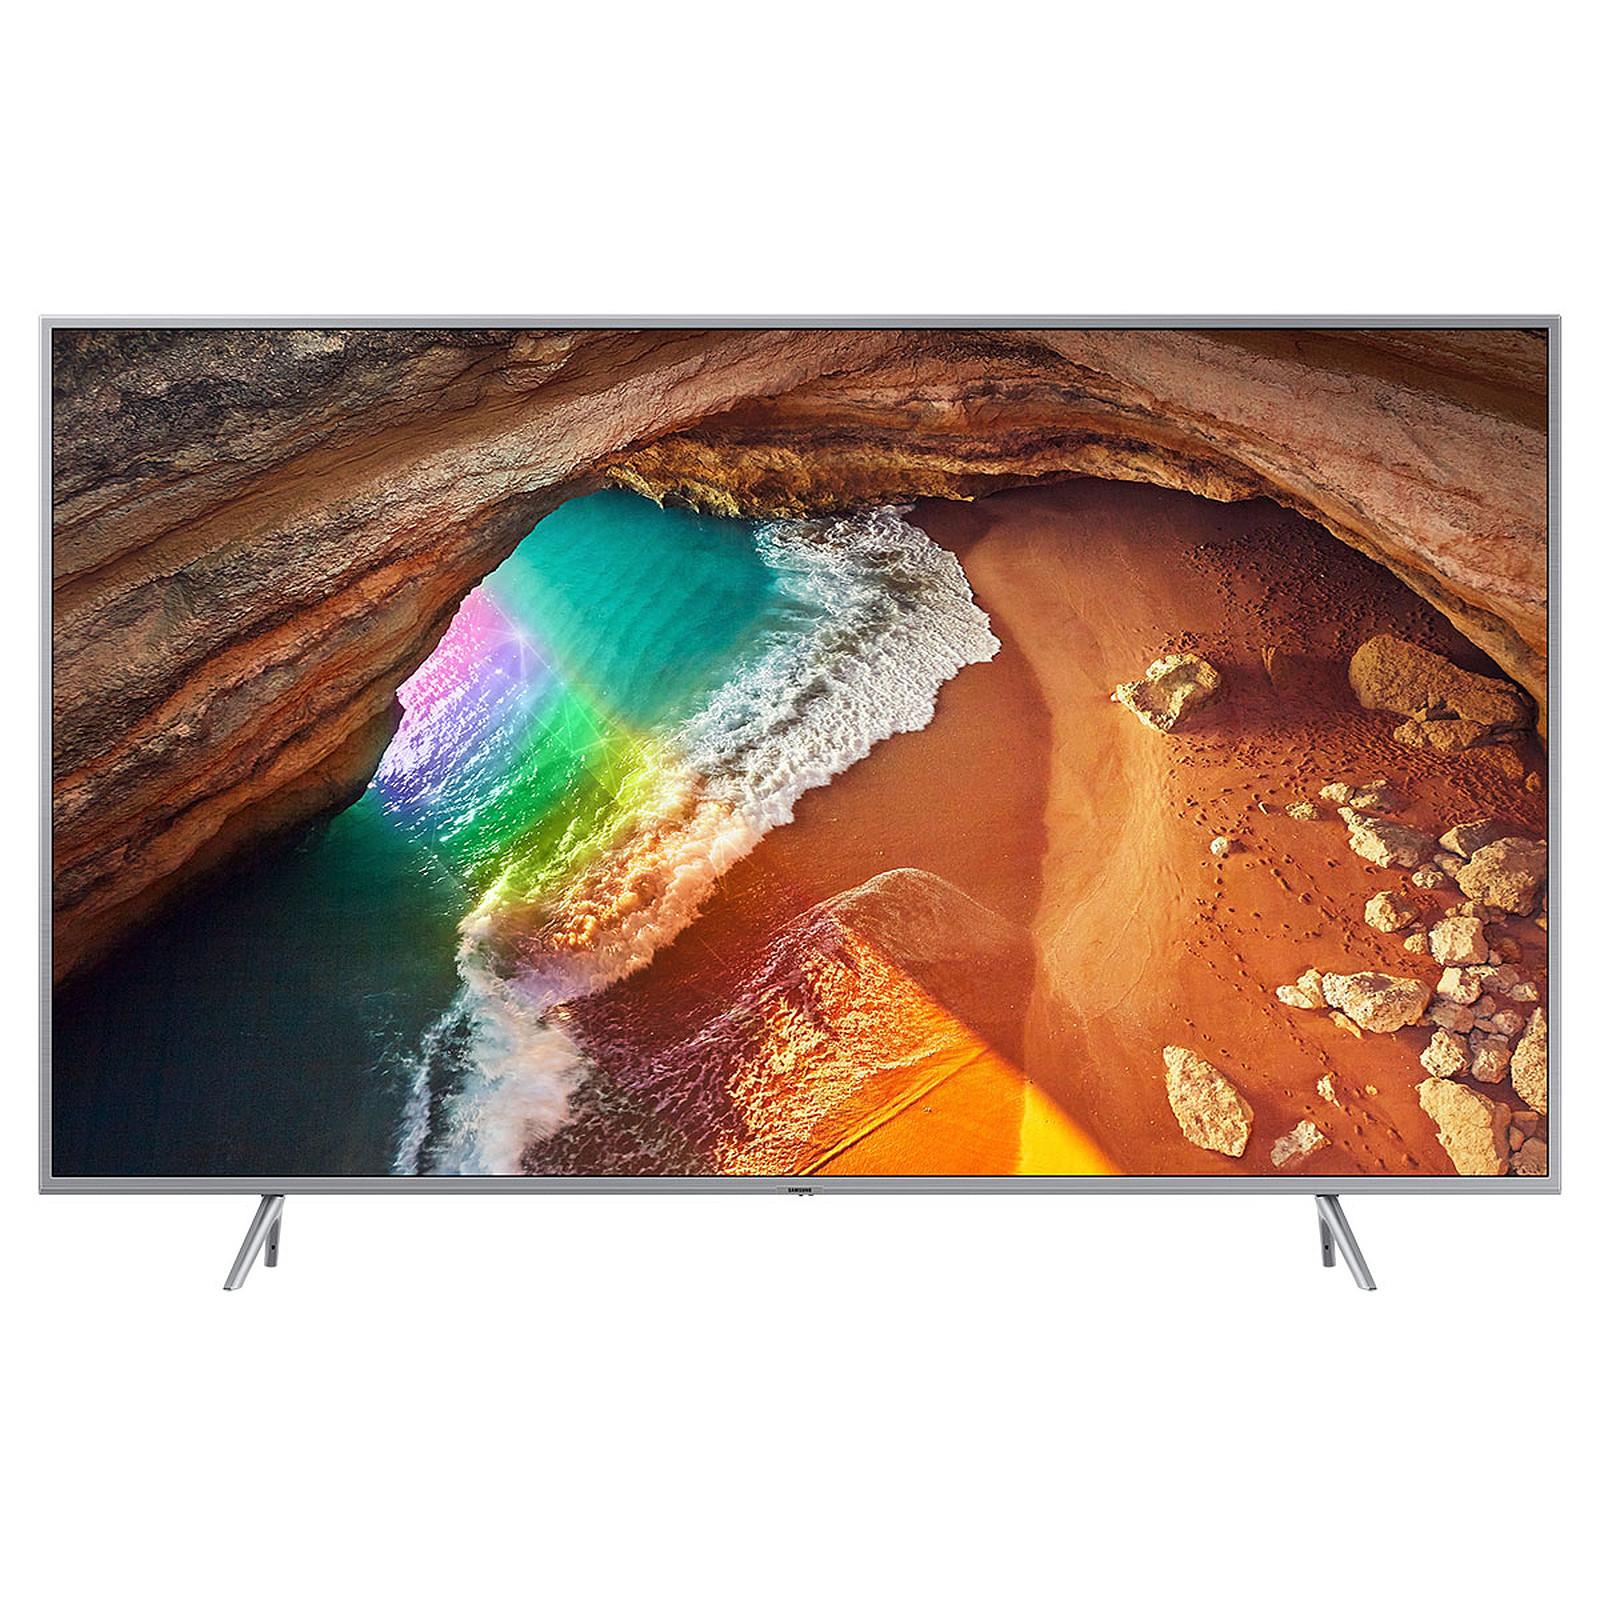 "TV 55"" Samsung QE55Q64R (2019) - QLED, 4K UHD, HDR 10+, 100 Hz, Smart TV"